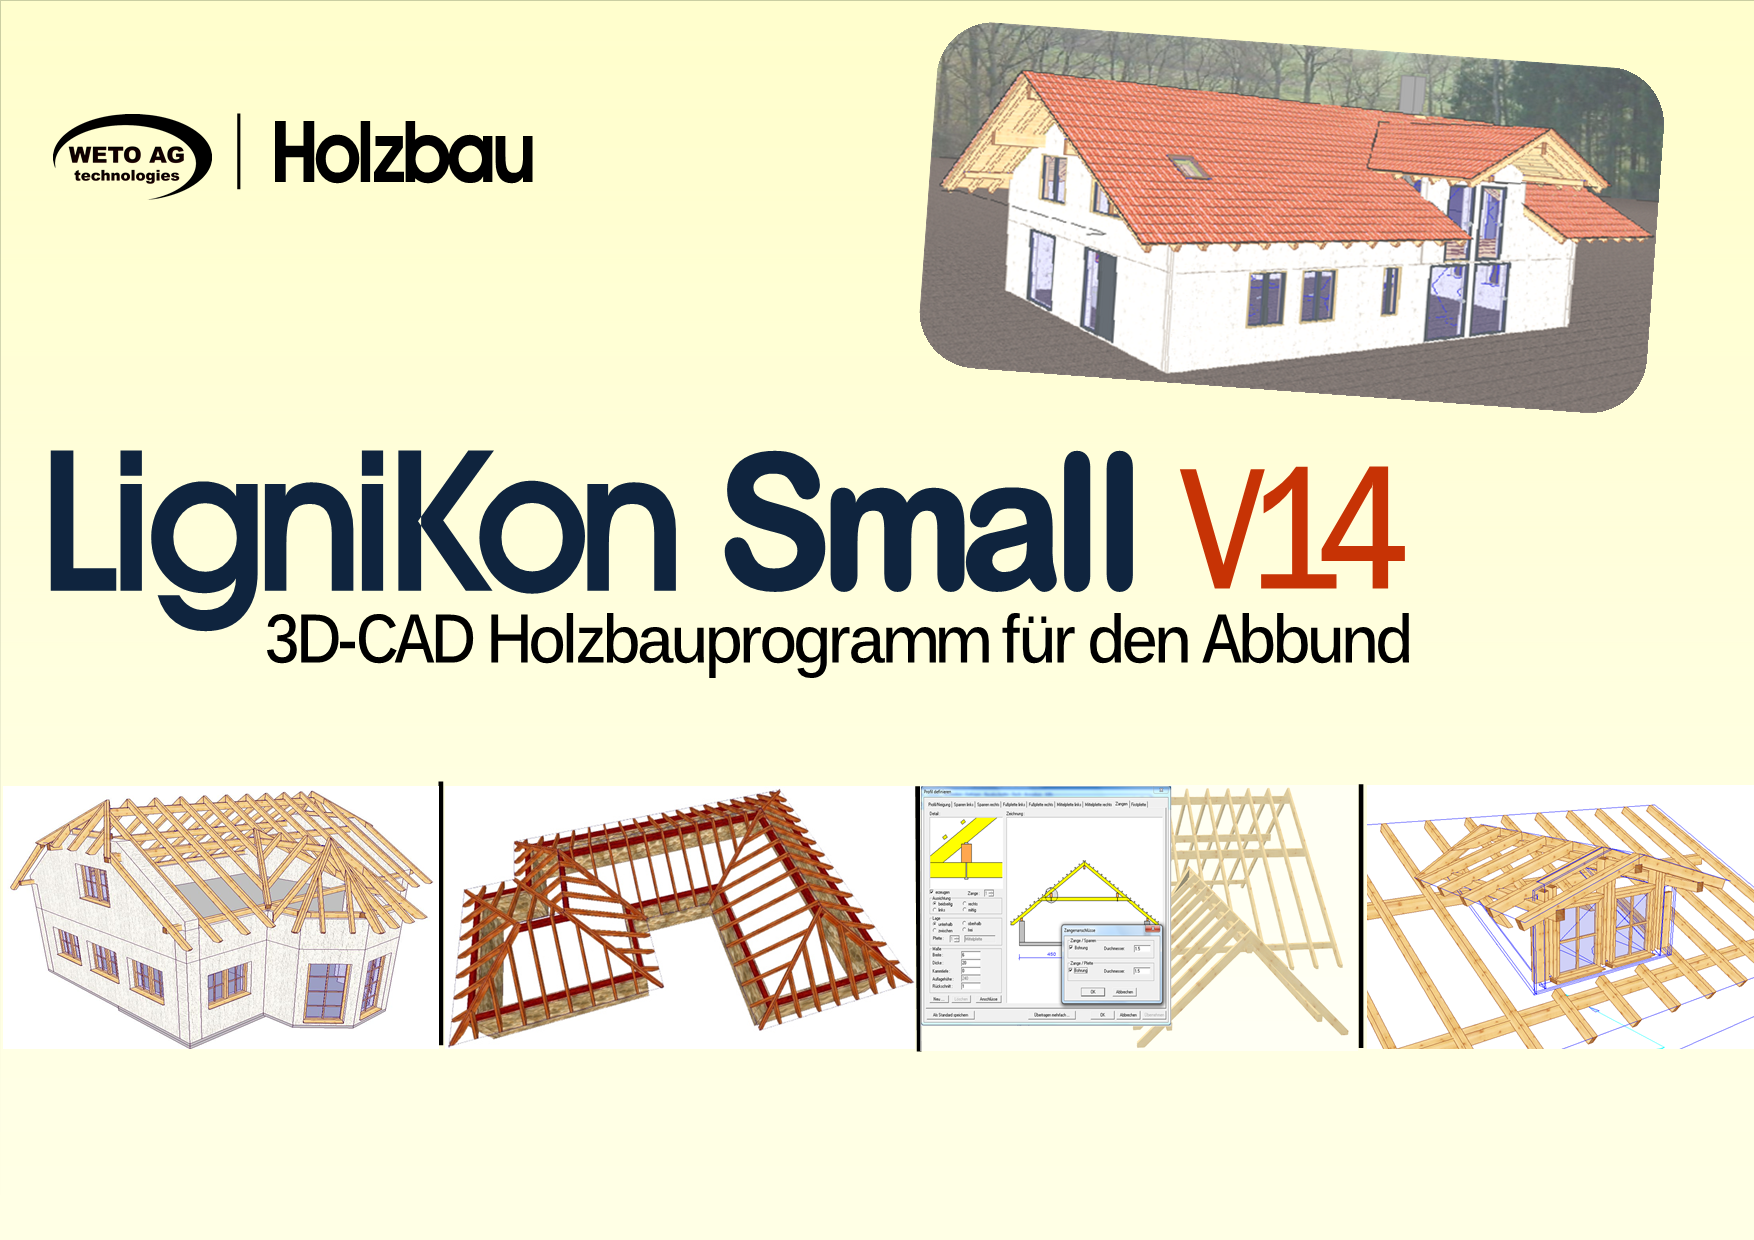 LIGNIKON Small V14 - zur Jahresmiete